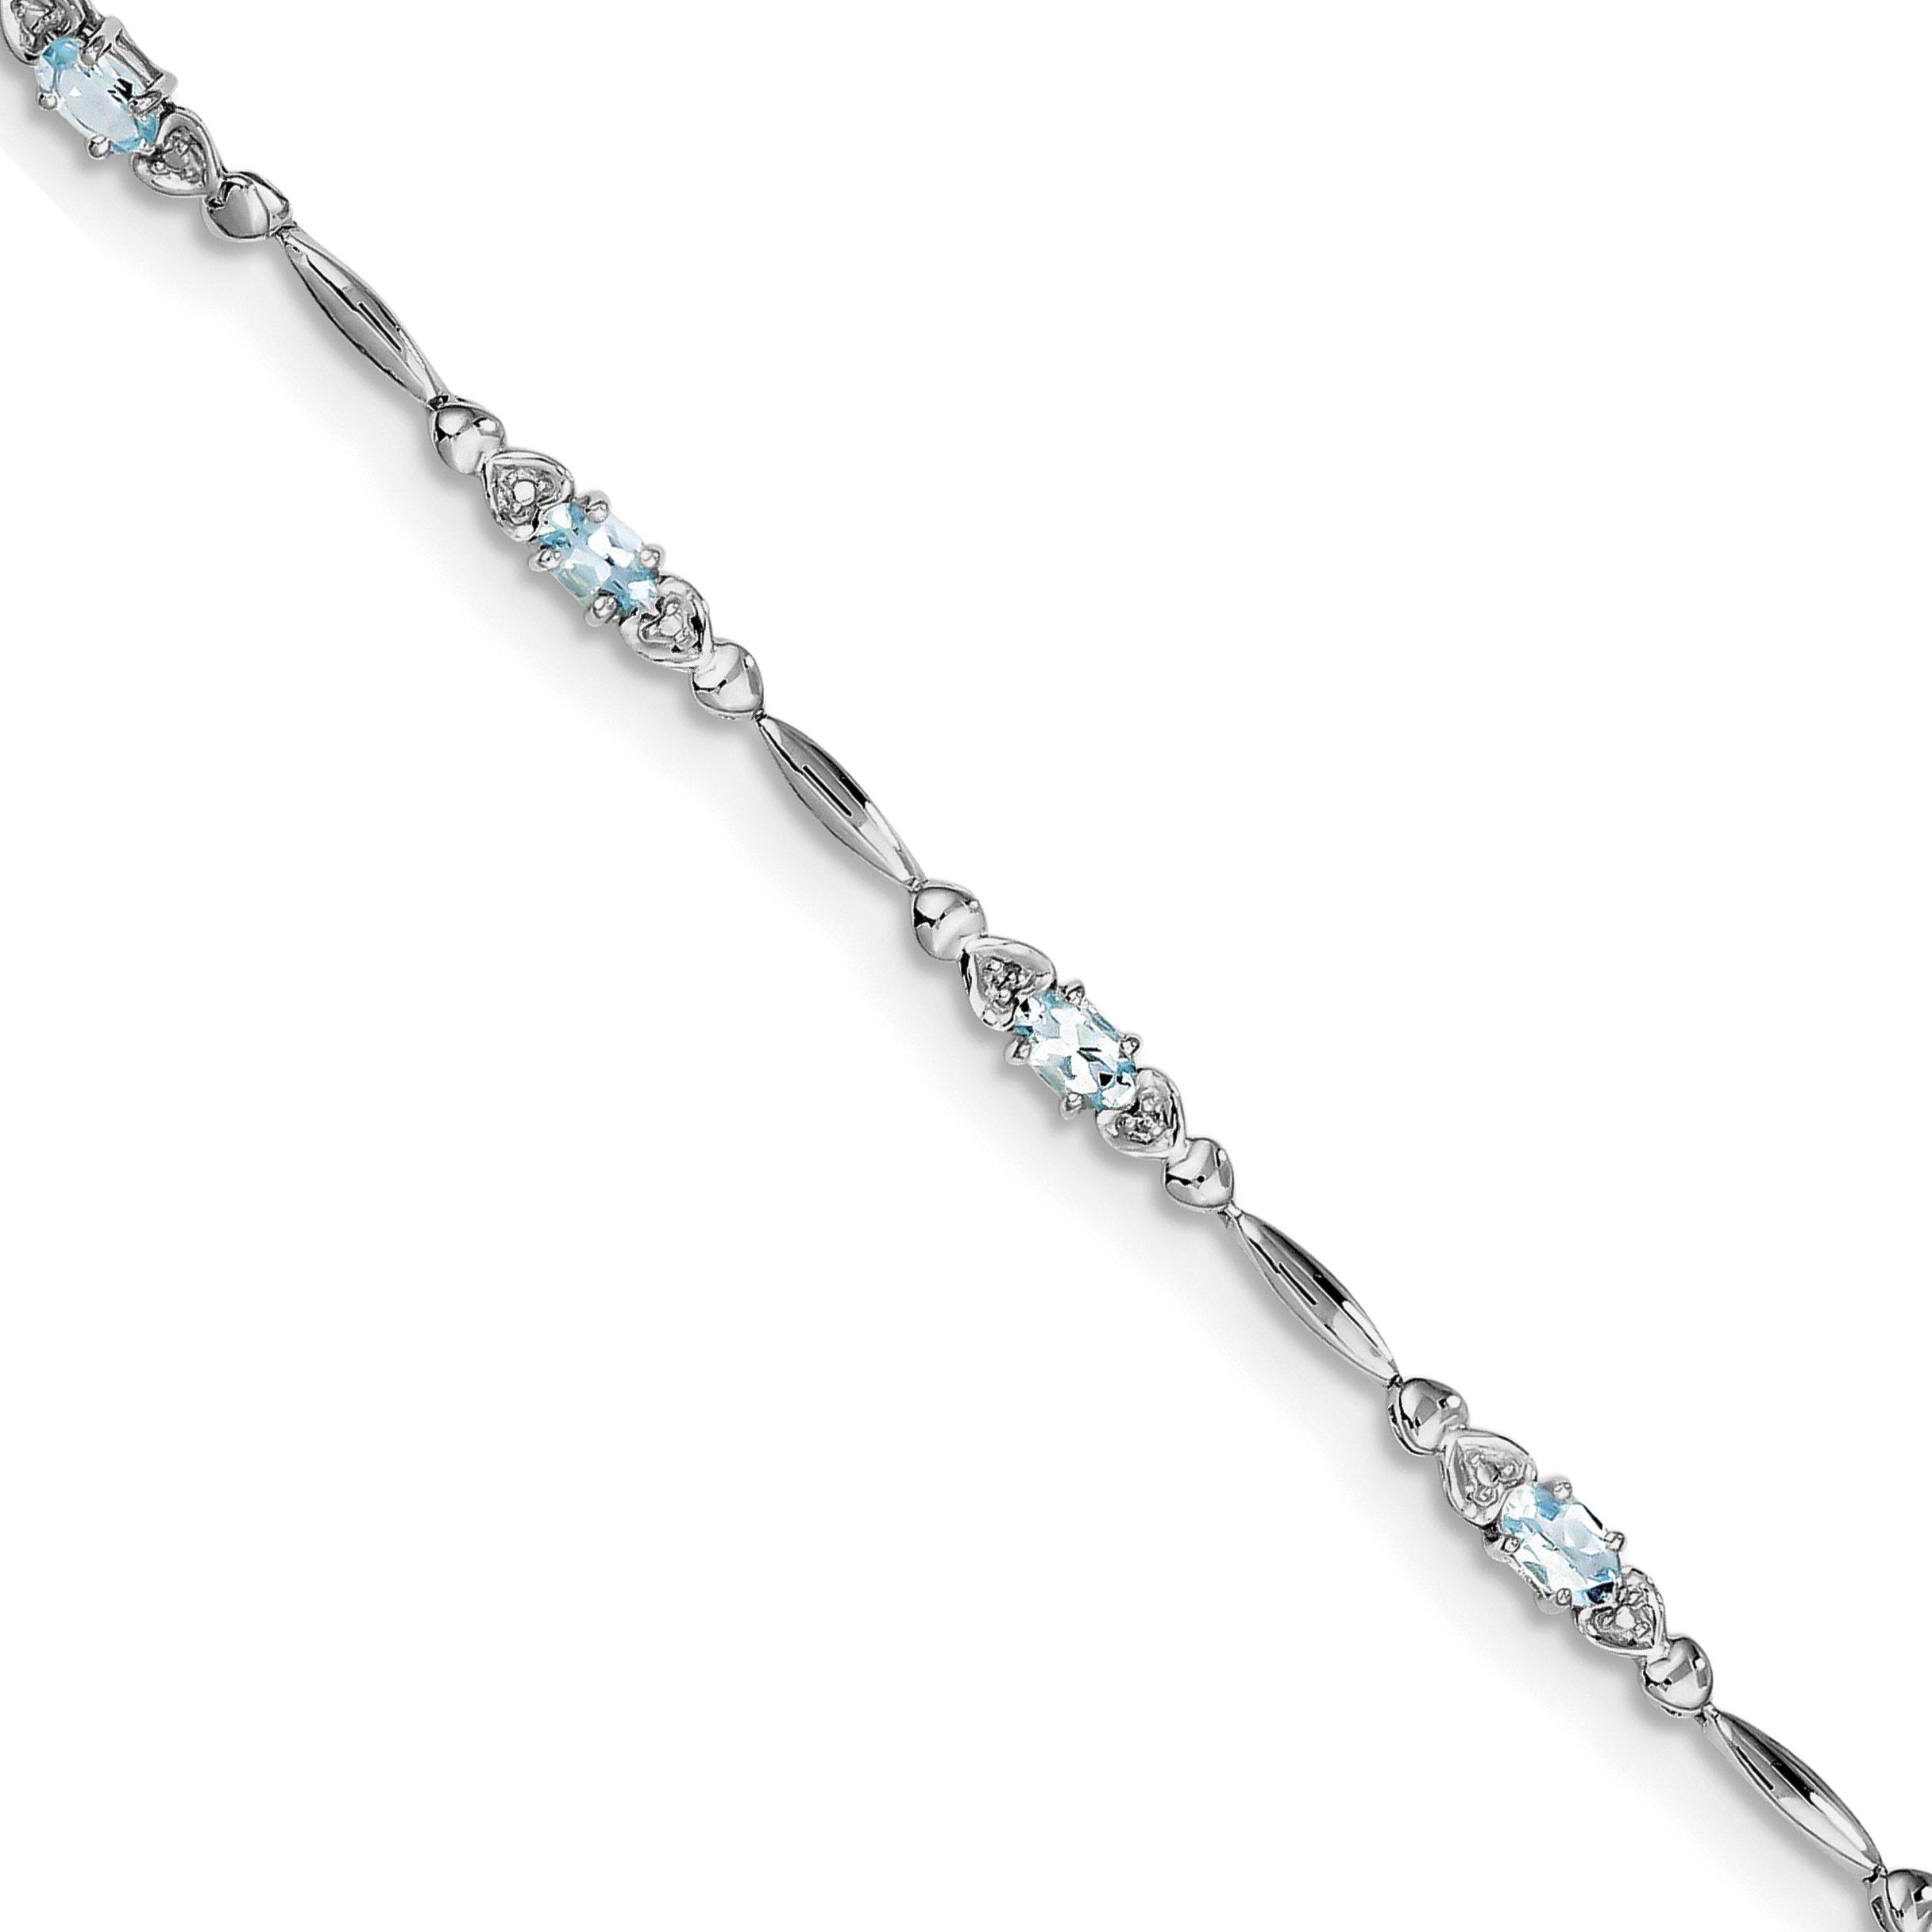 ICE CARATS 925 Sterling Silver Blue Aquamarine Diamond Bracelet 7 Inch /love Gemstone Fine Jewelry Gift Set For Women Heart